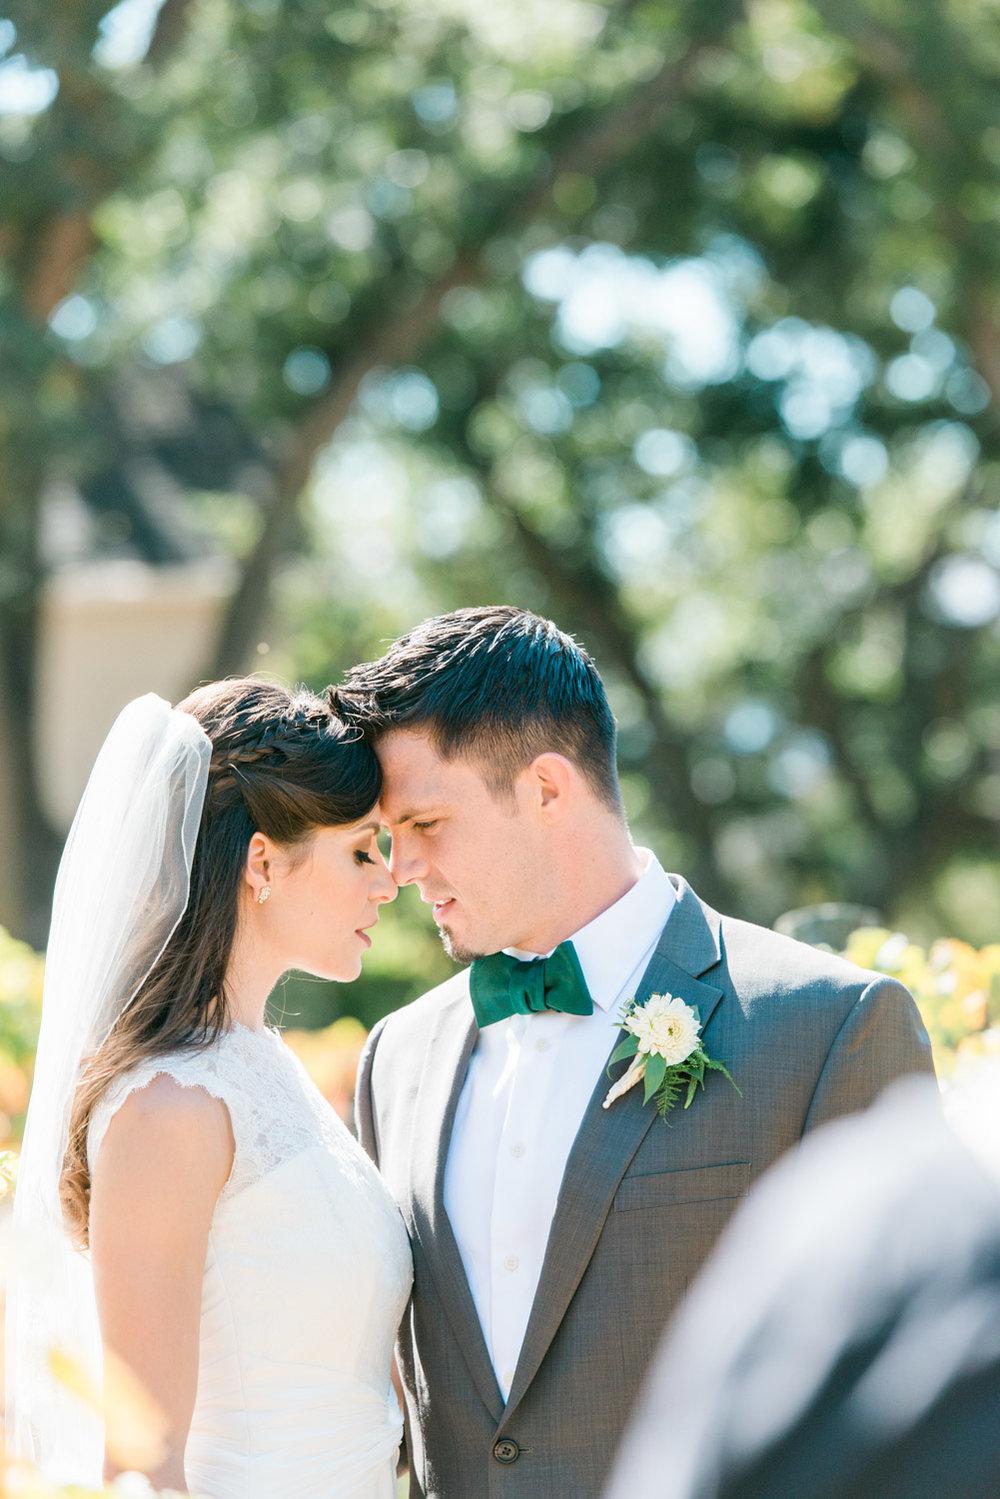 bride-groom-fall-wedding-photography-afewgoodclicks.net